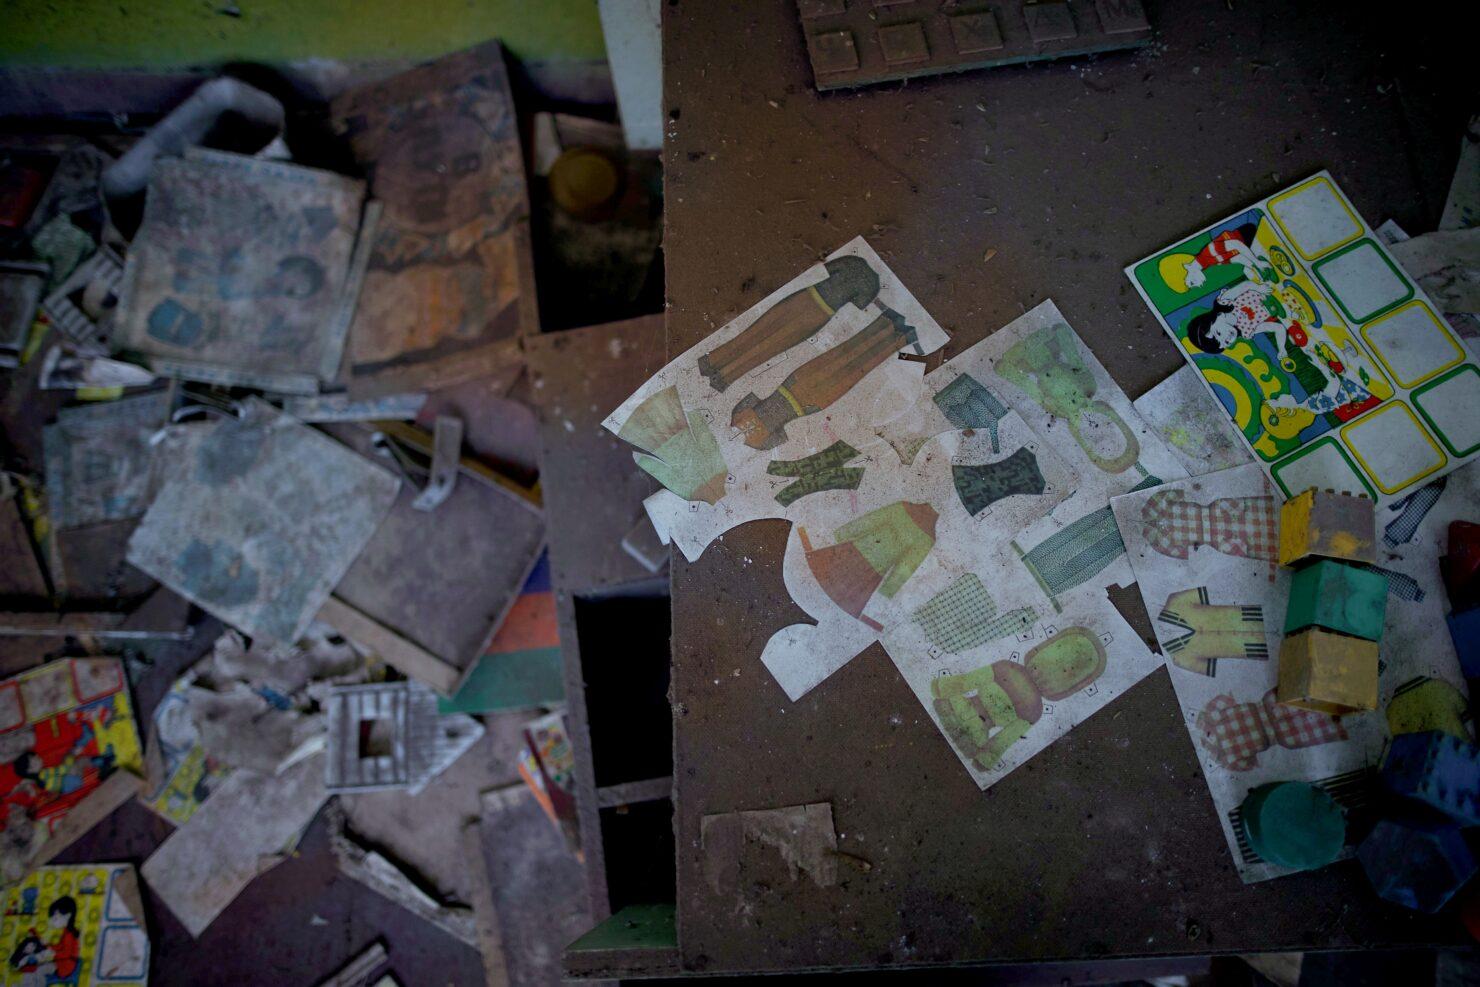 metro-exodus-brought-to-life-02-comparison-remnants-chernobyl